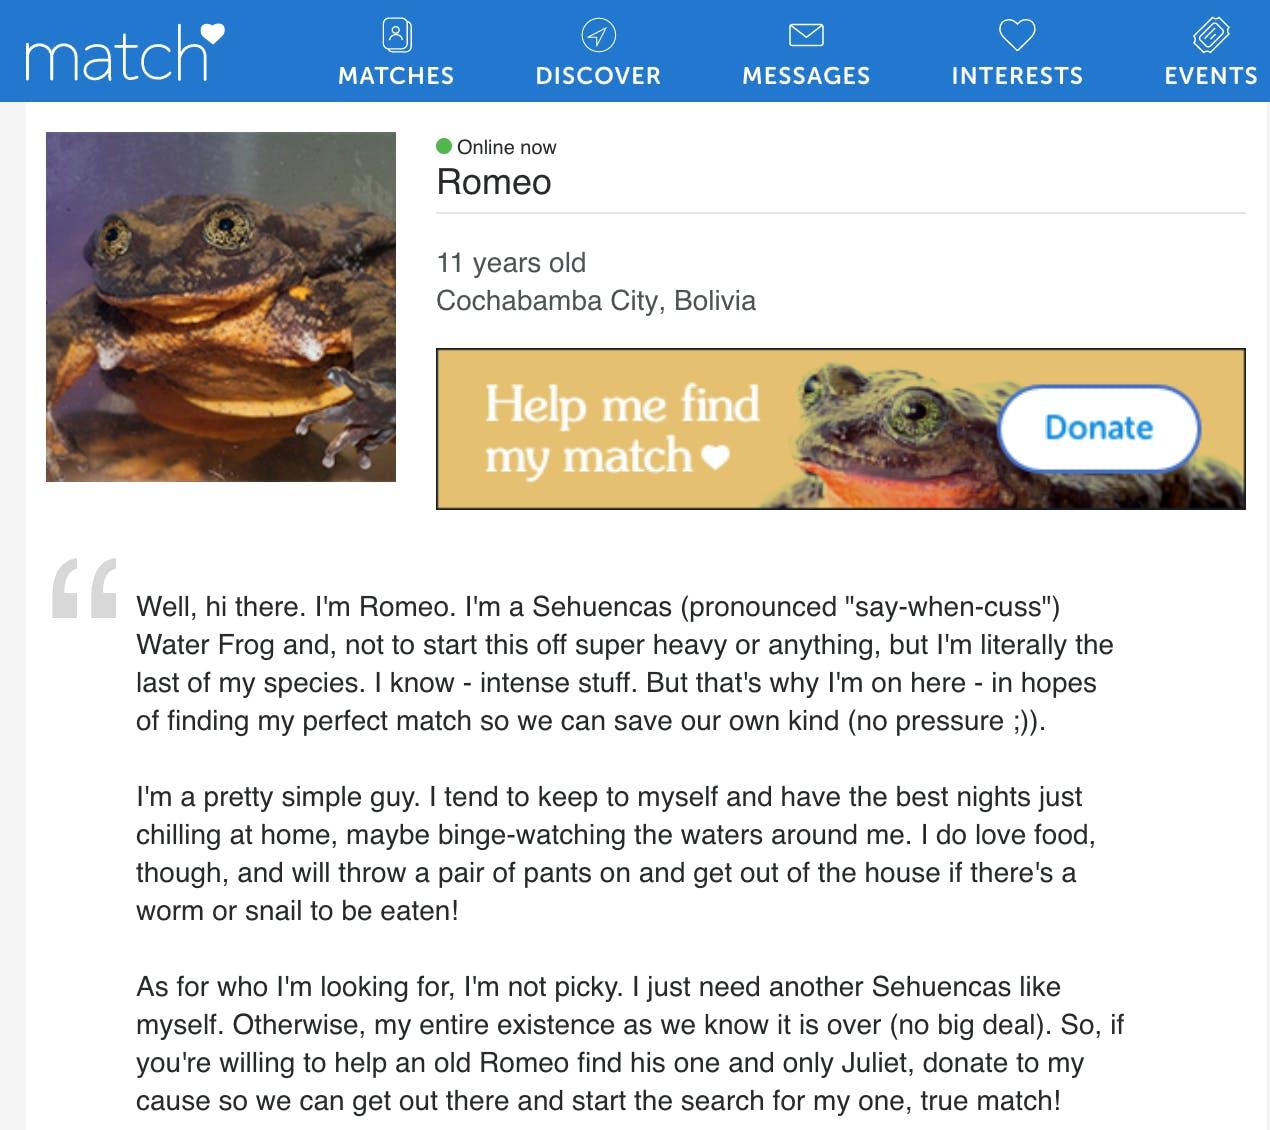 Romeo the frog's Match.com profile